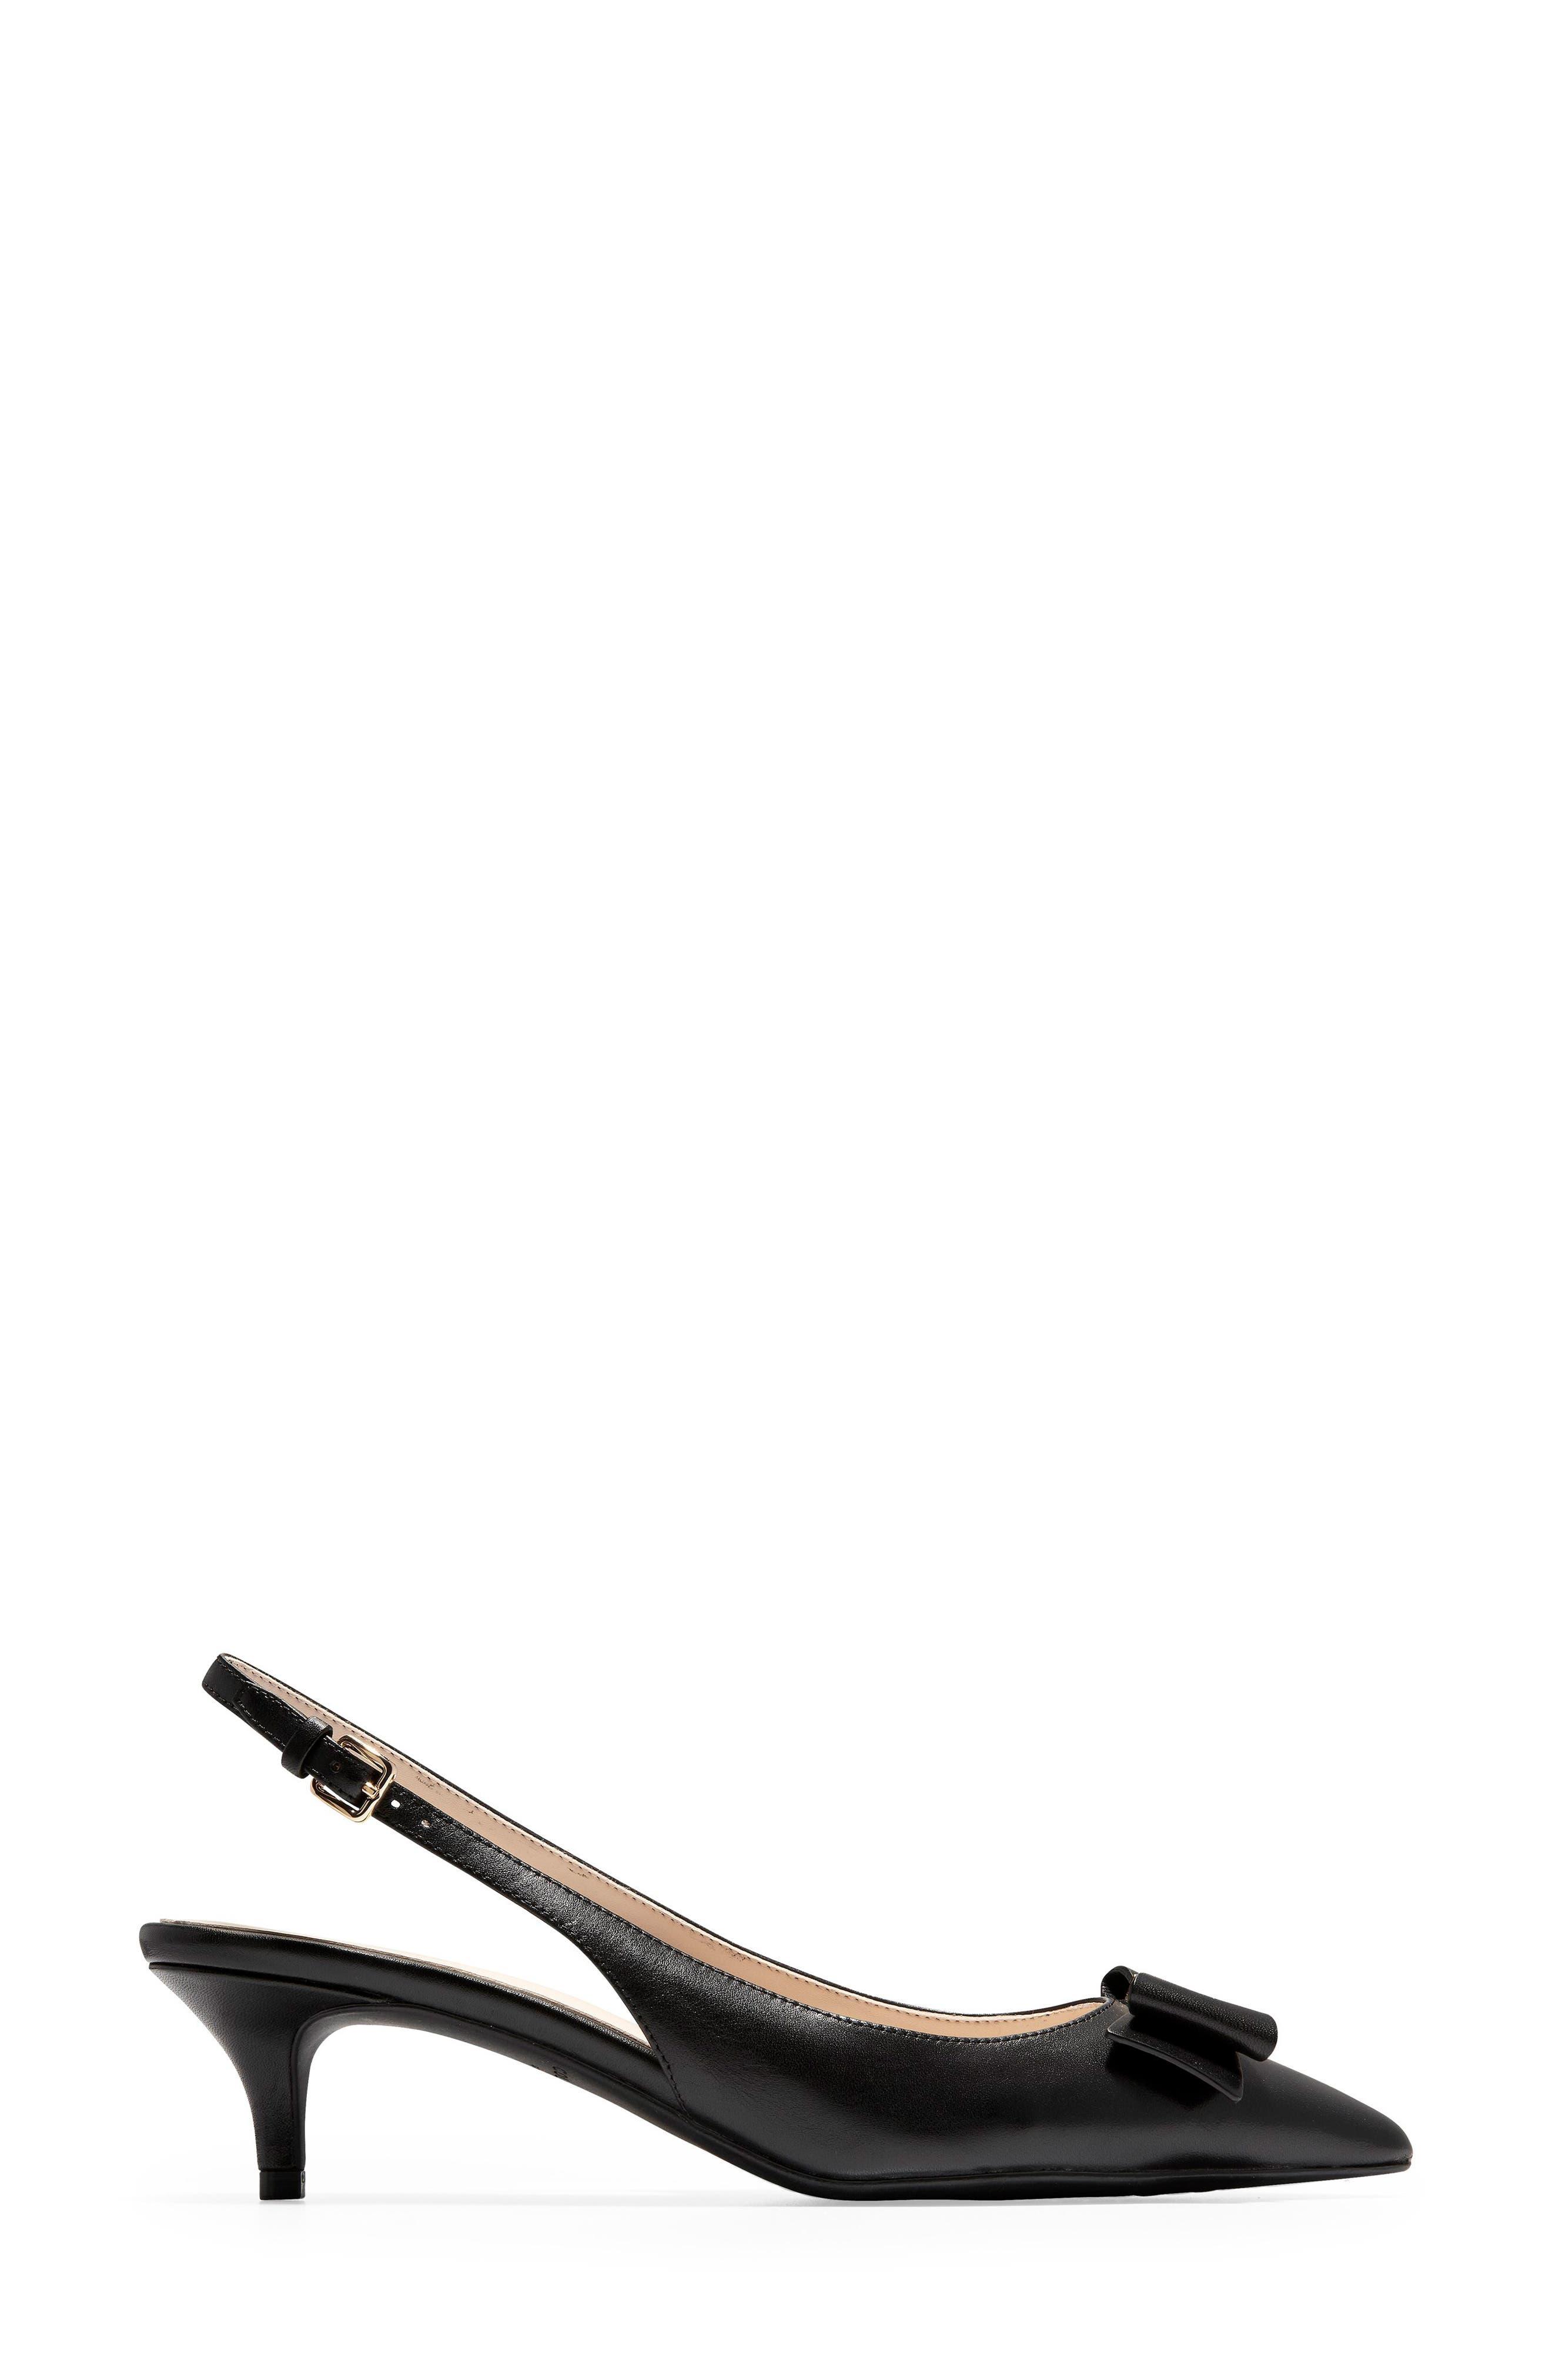 COLE HAAN, Tali Bow Slingback Pump, Alternate thumbnail 3, color, BLACK LEATHER